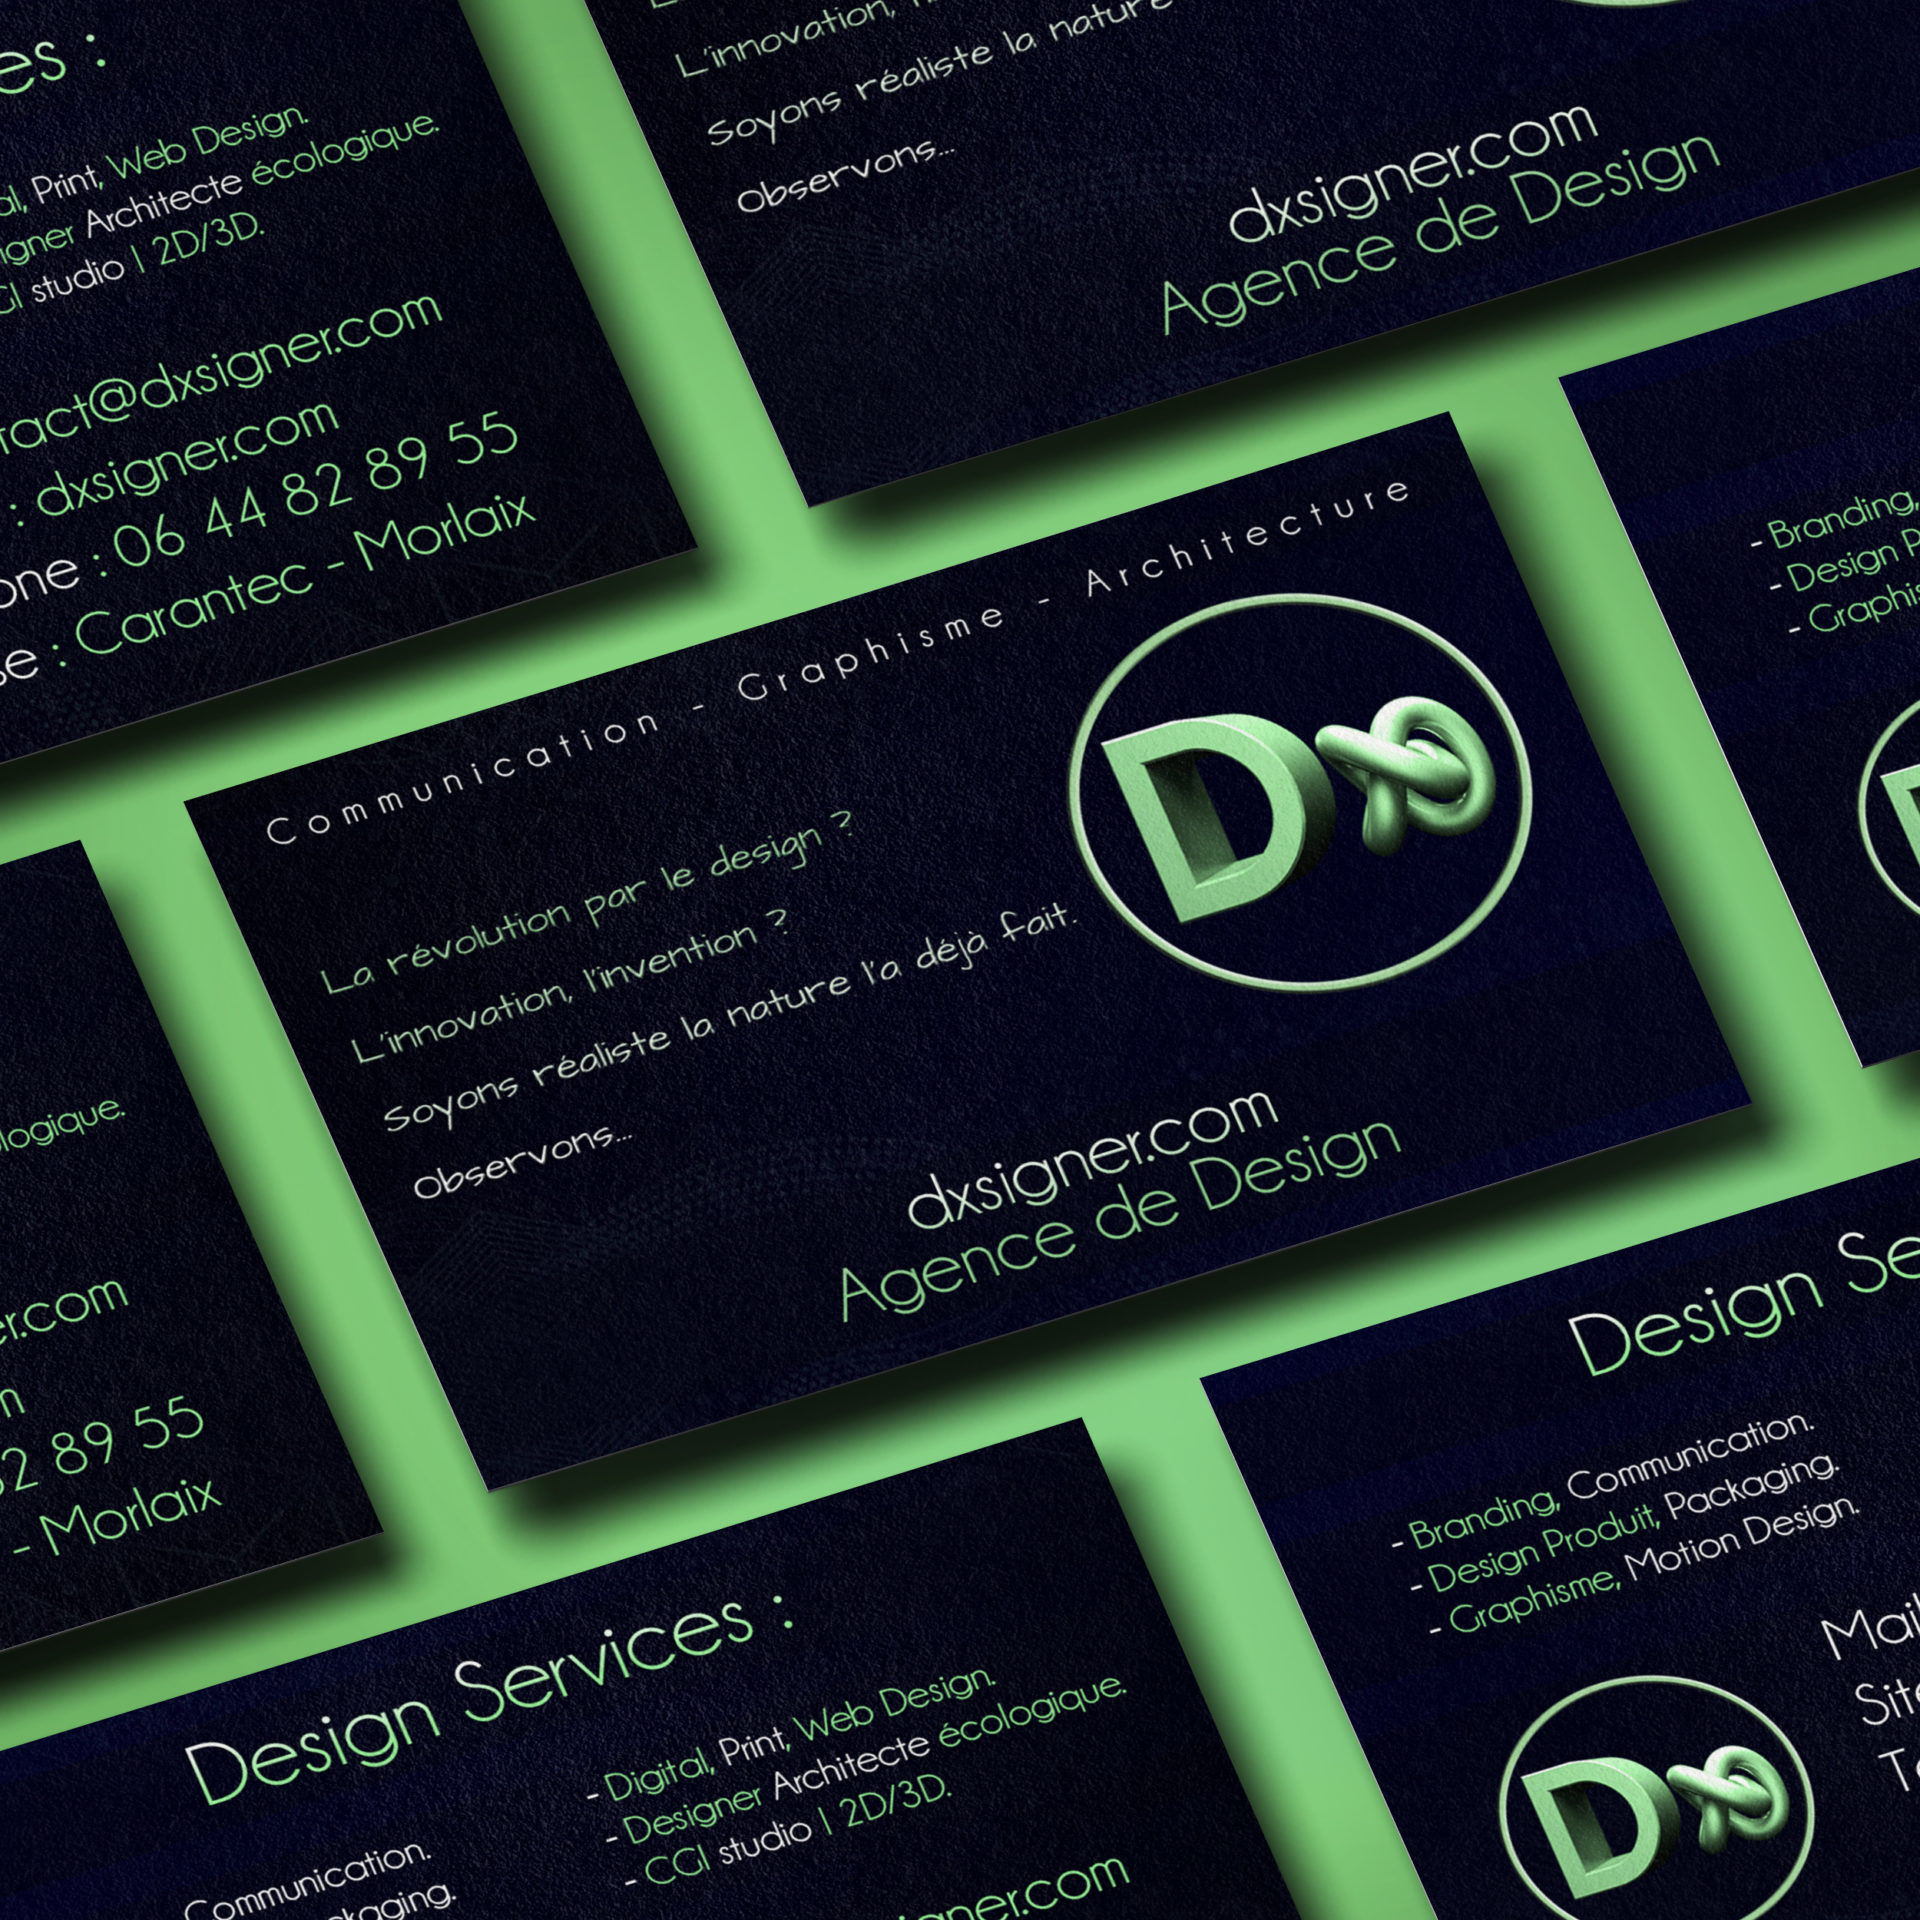 Graphiste - Graphisme - Design Designer - Bretagne Finistère - Brest Quimper Morlaix - sur mesure - Carte de visite Dxsigner - 001